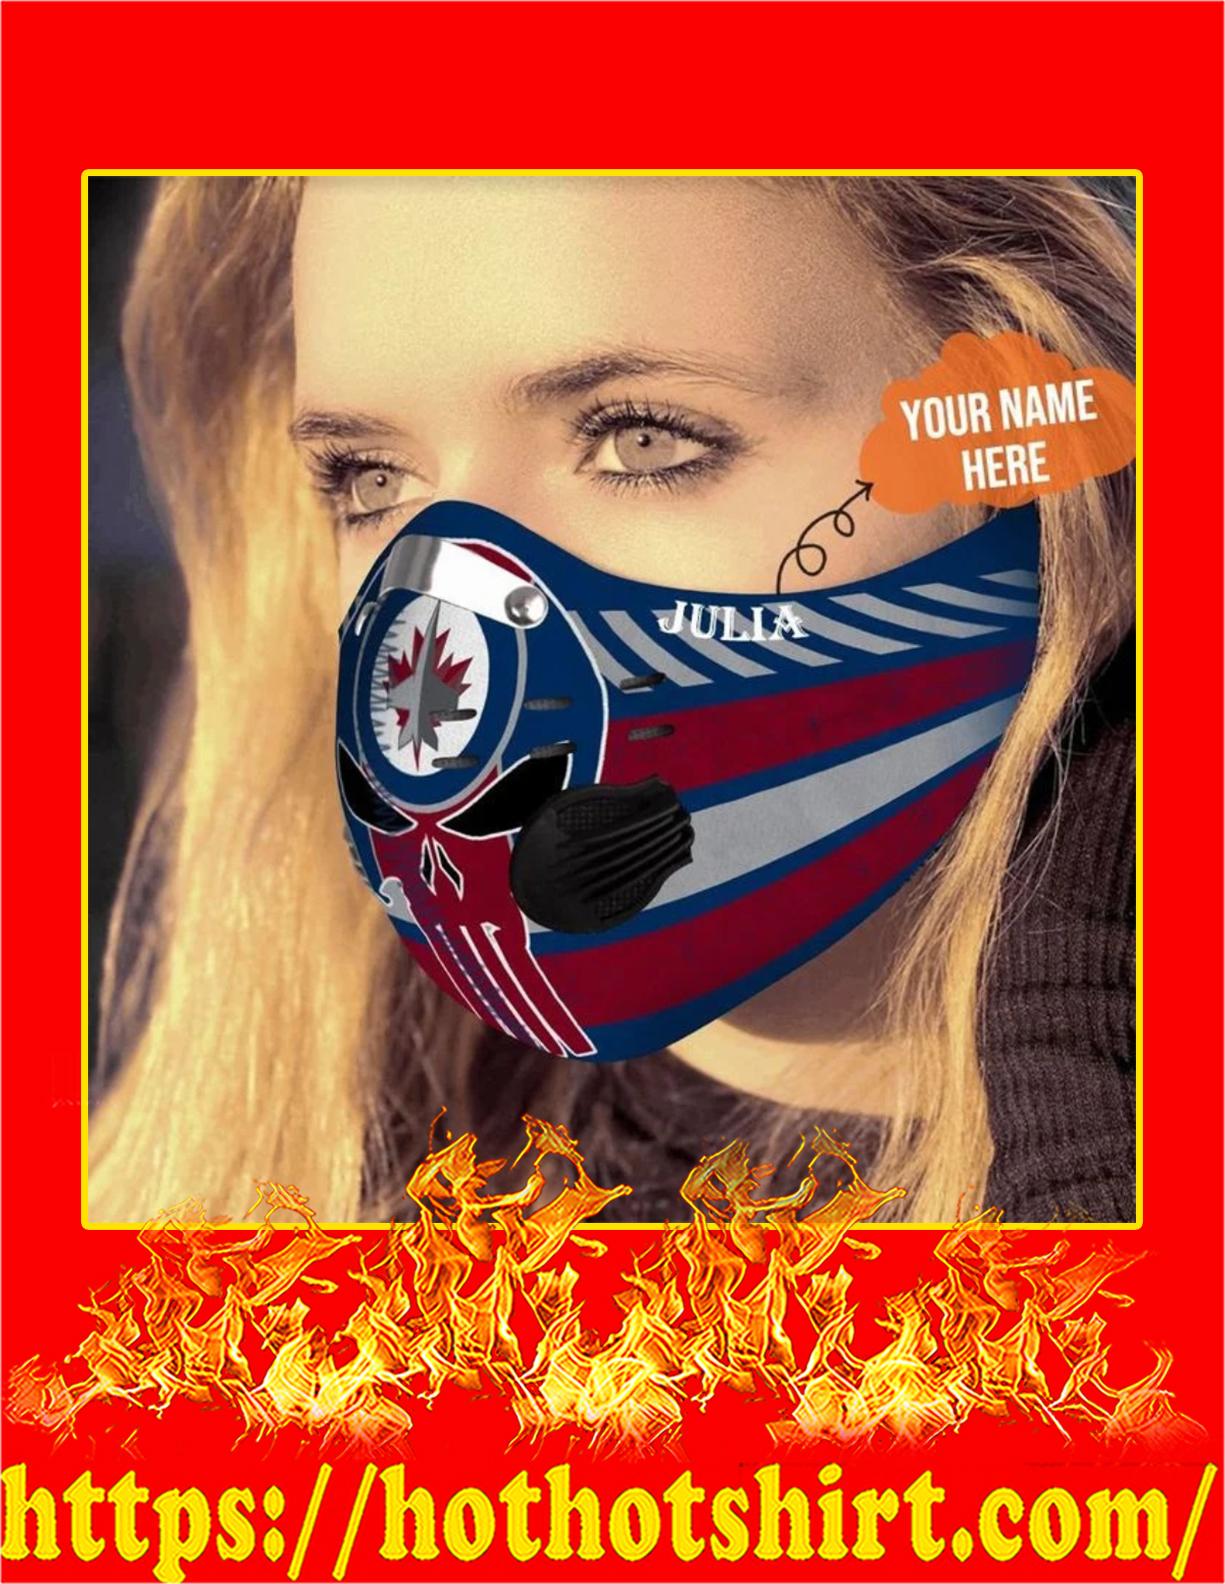 Winnipeg jets punisher skull personalized custom name filter face mask - Pic 2